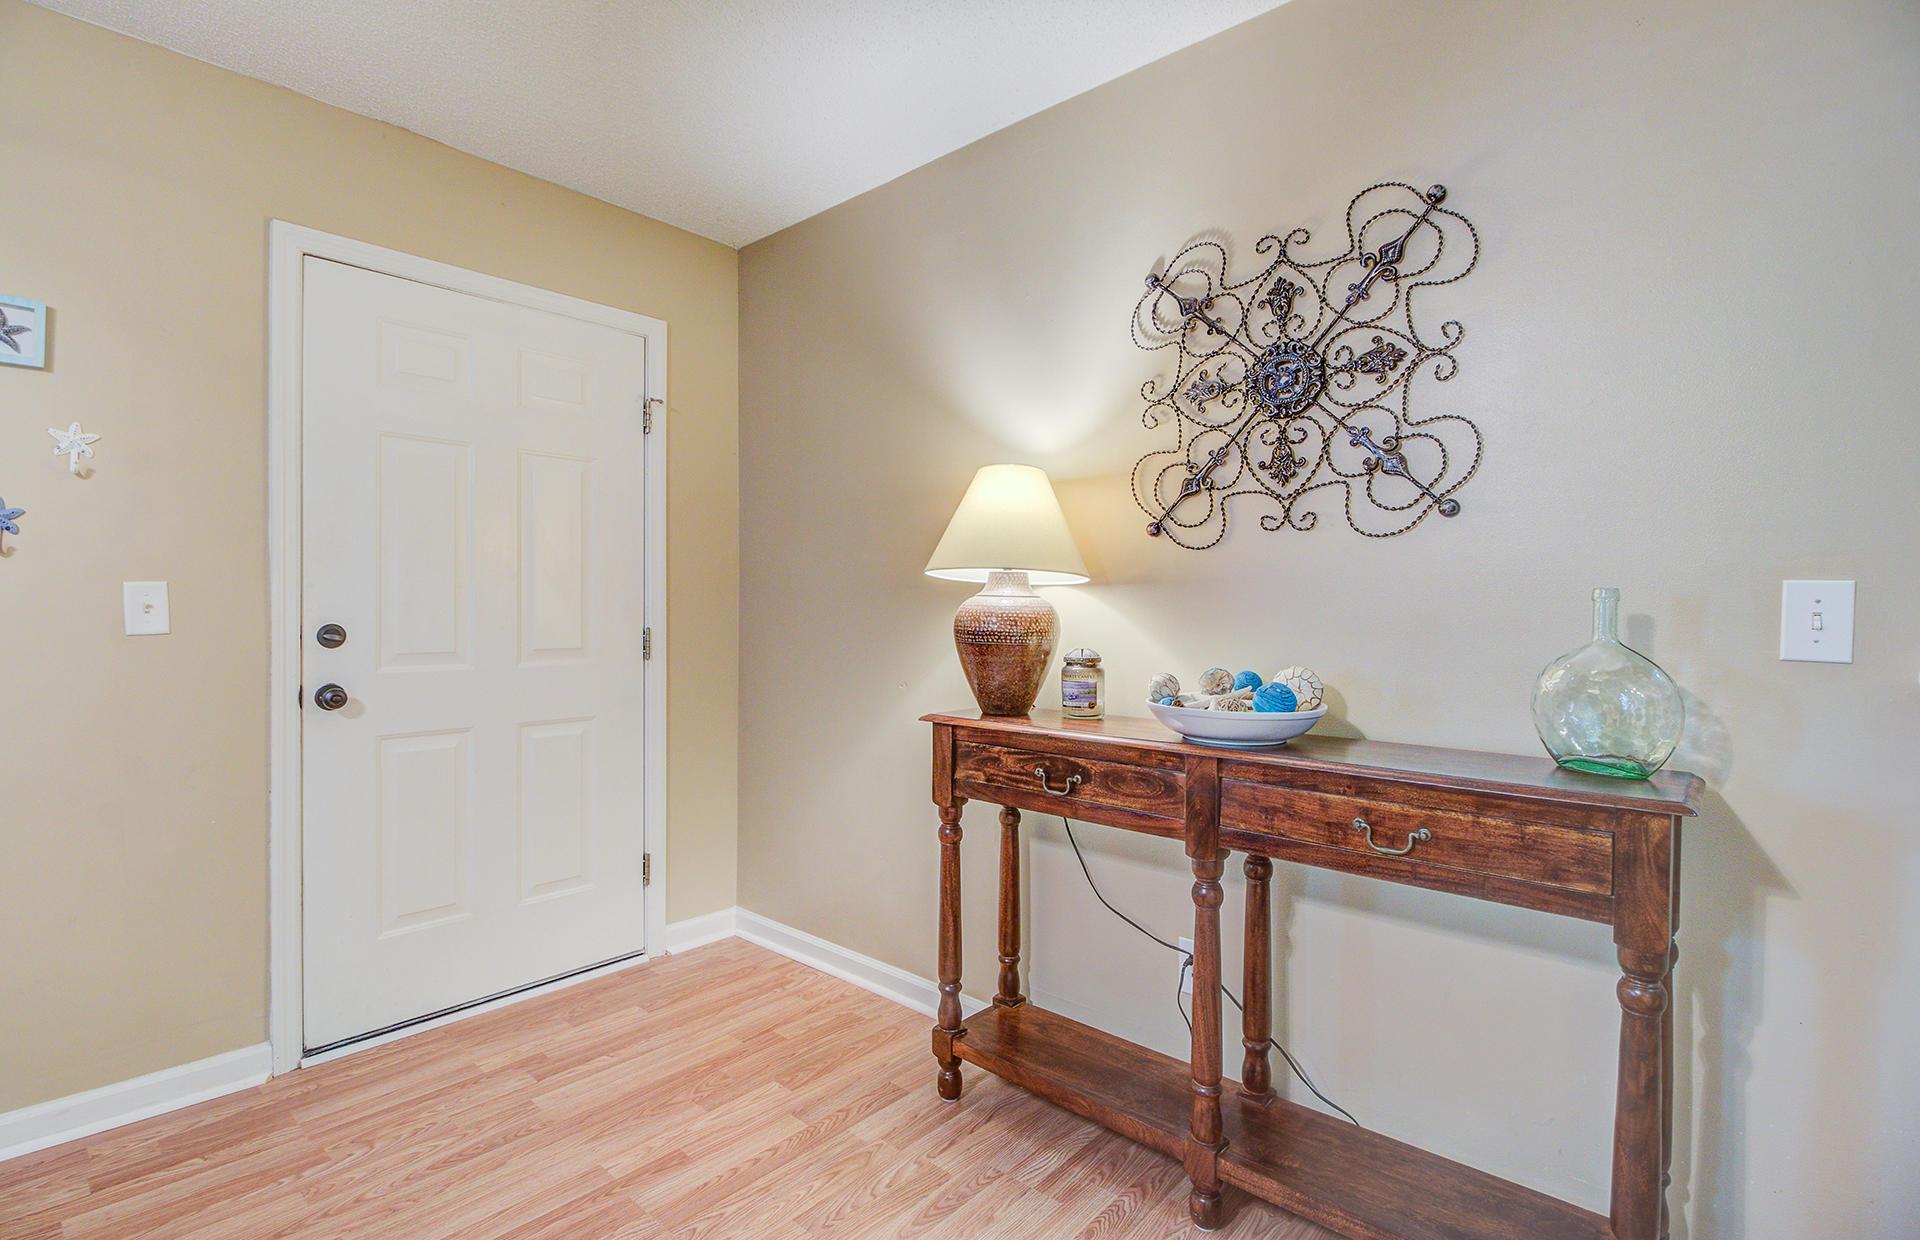 Wando East Homes For Sale - 1664 Hunters Run, Mount Pleasant, SC - 25